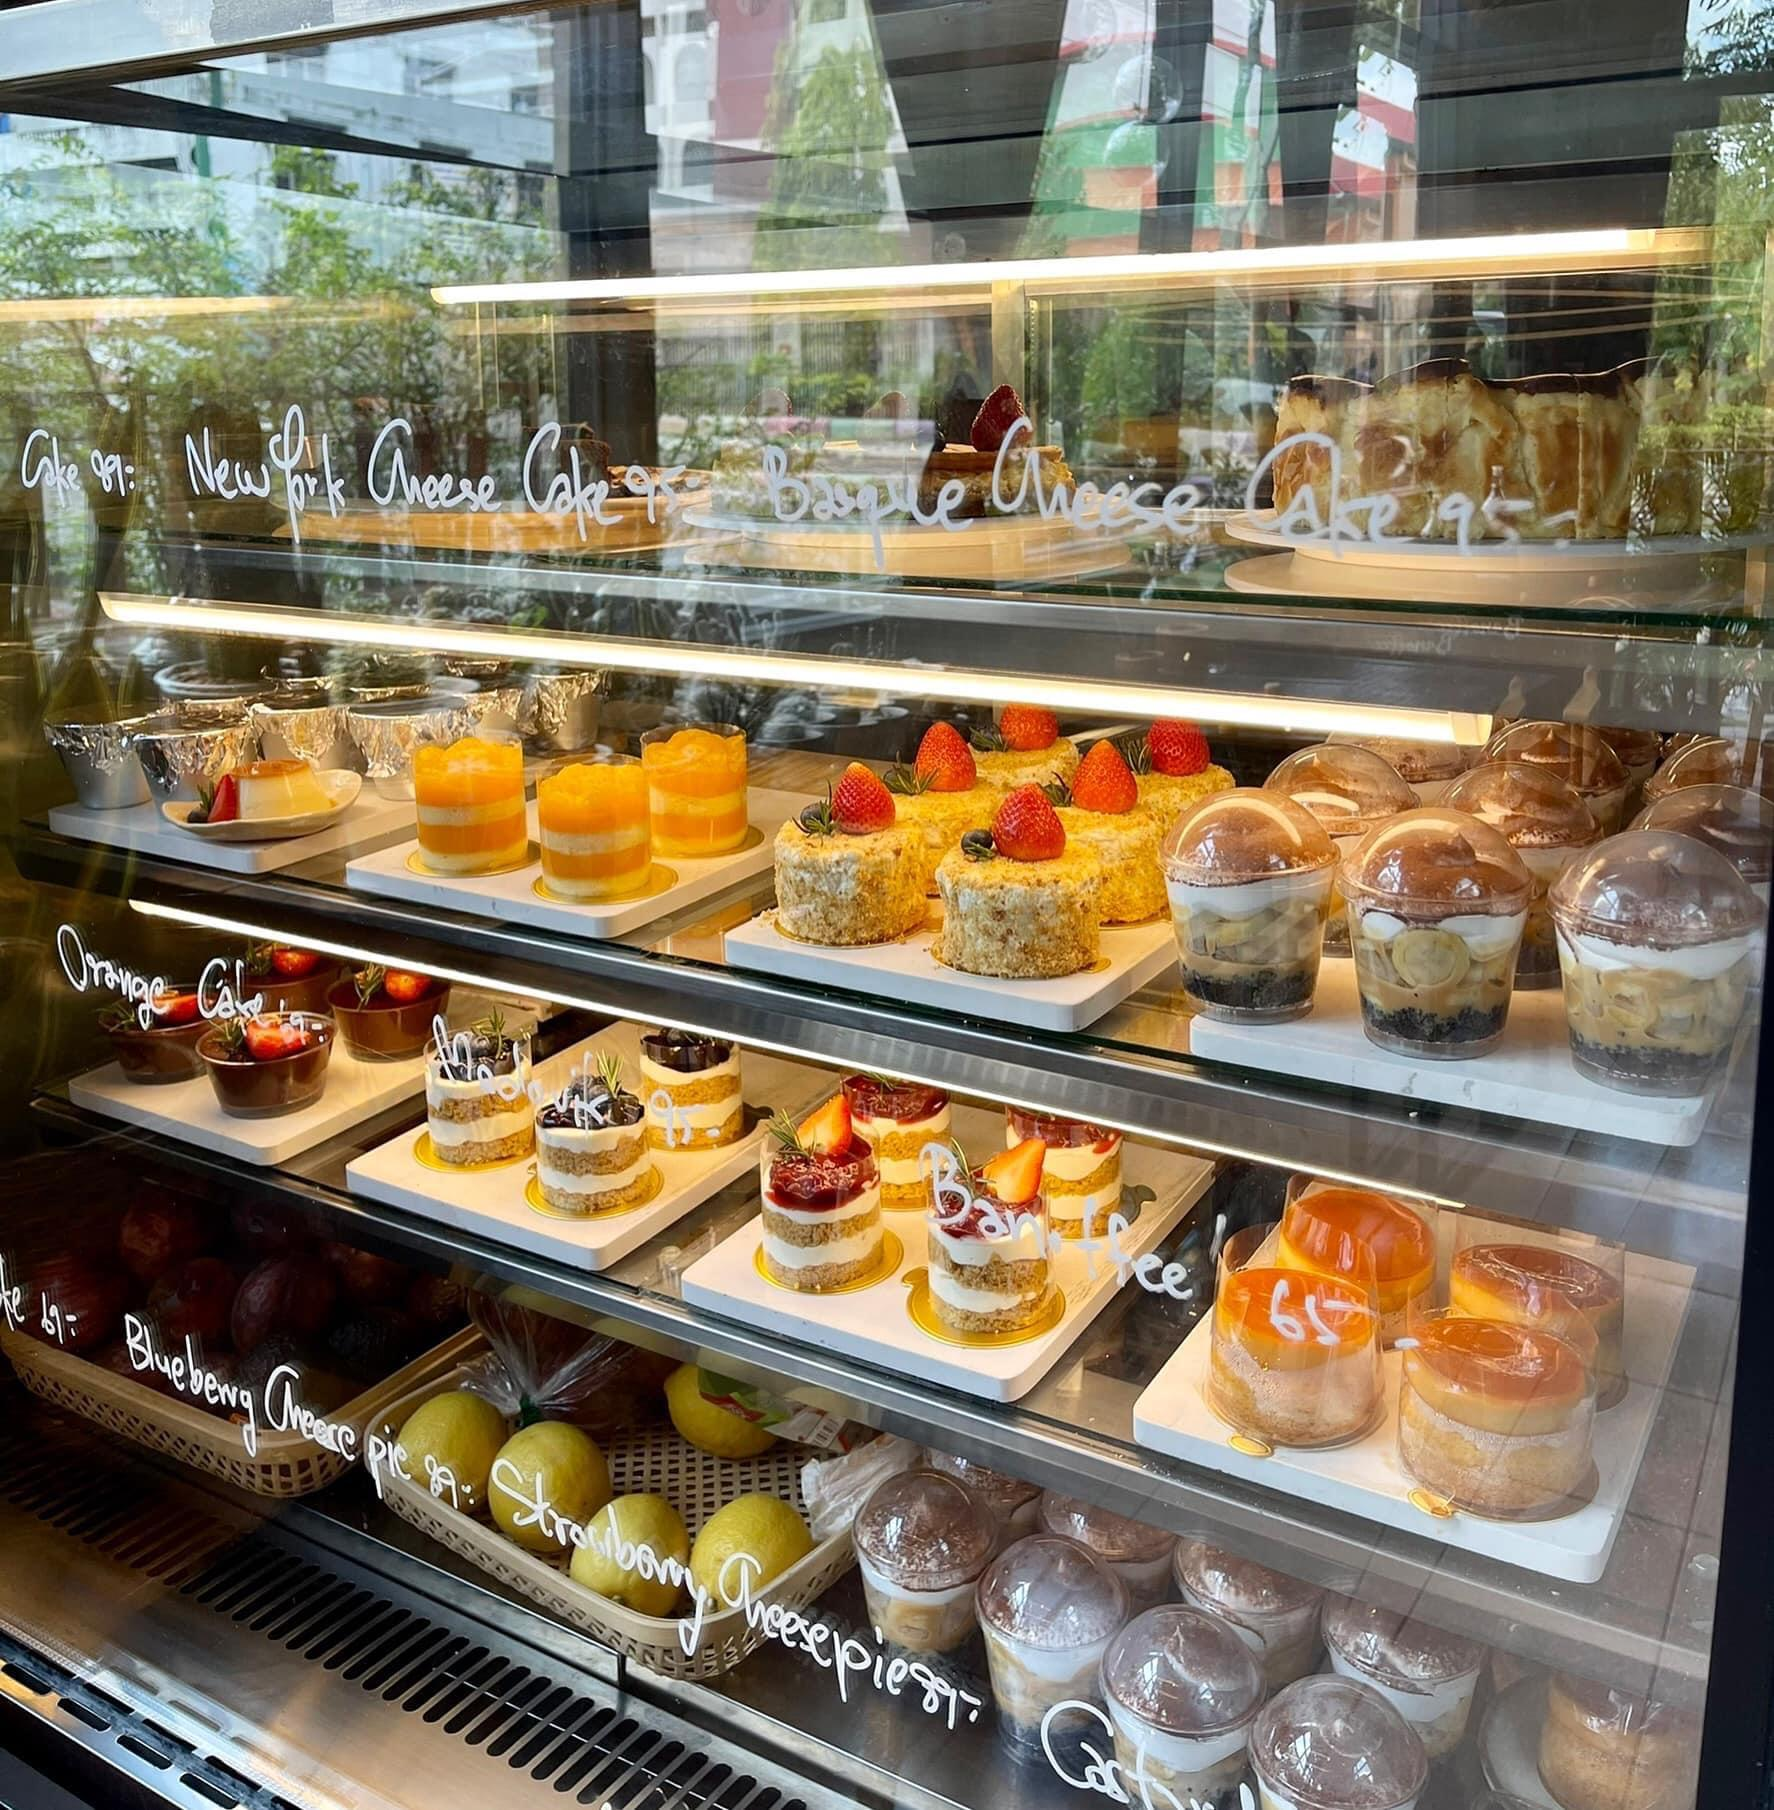 2. Banoffee' Dessert & Cafe 02